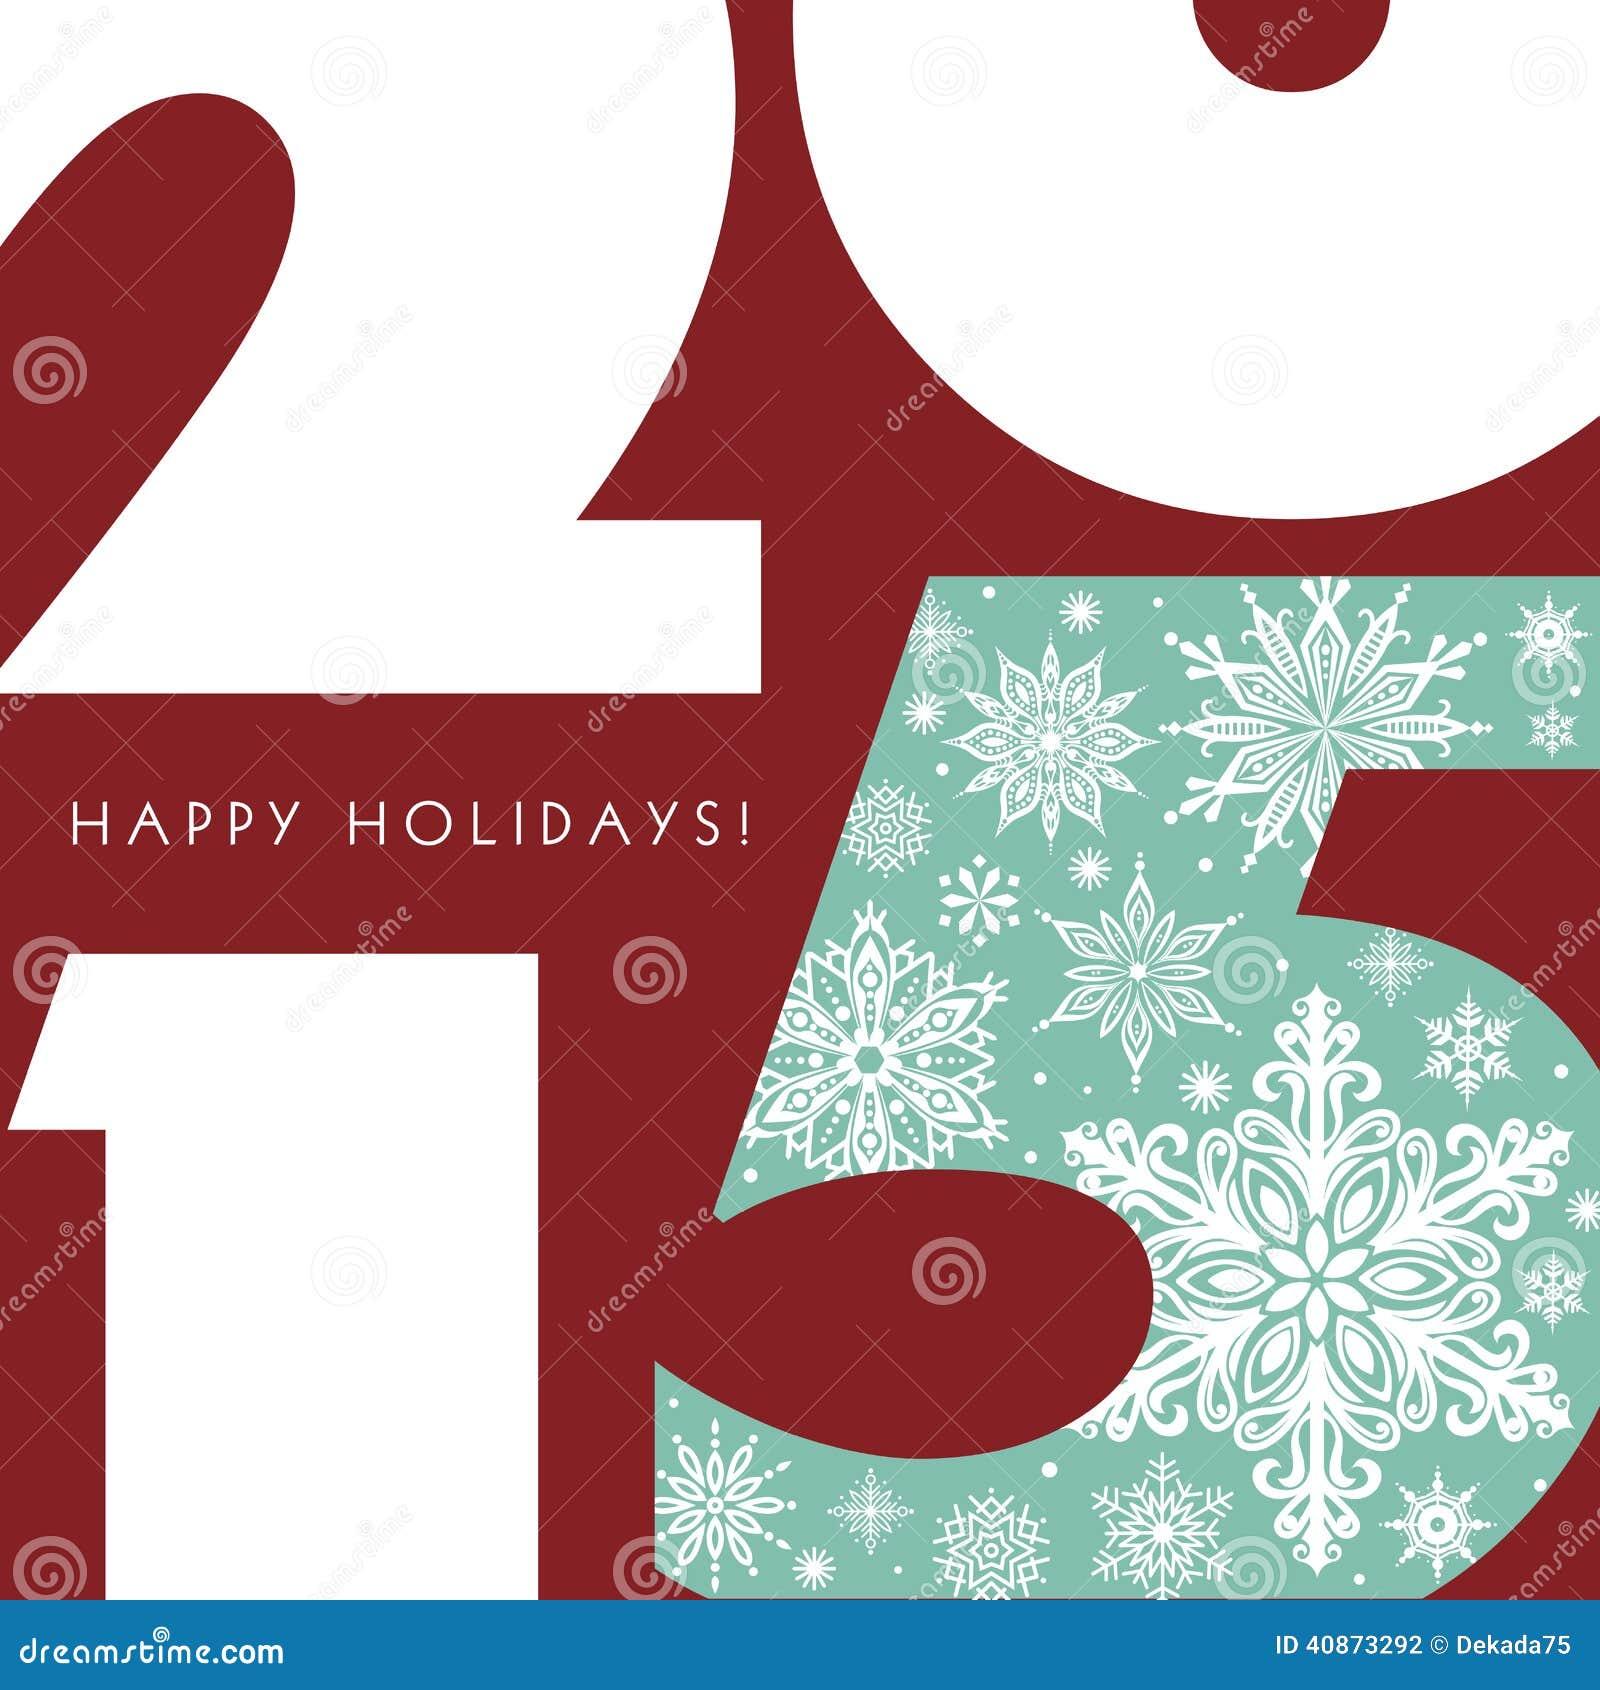 Download Happy Holidays 2015 stock illustration. Illustration of stylish - 40873292